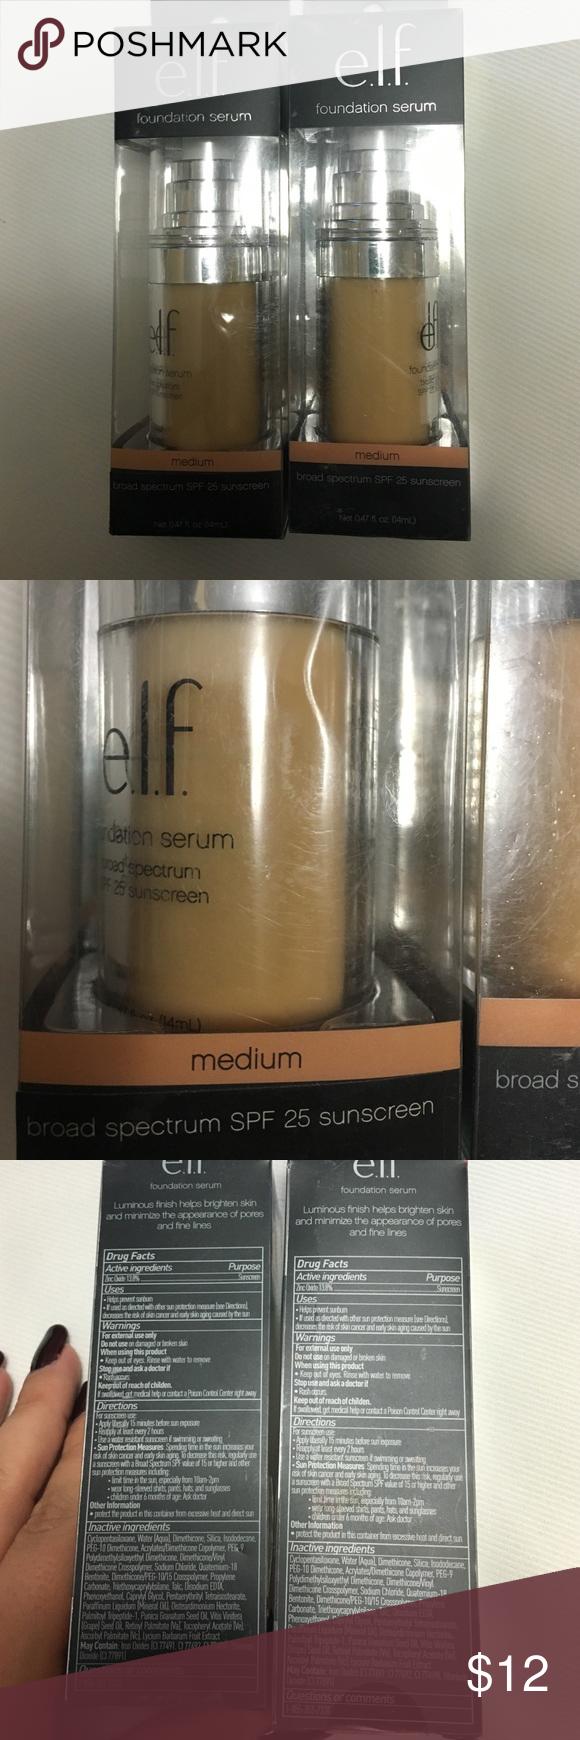 Lot of 2 elf medium foundation serum New! ELF Makeup Foundation